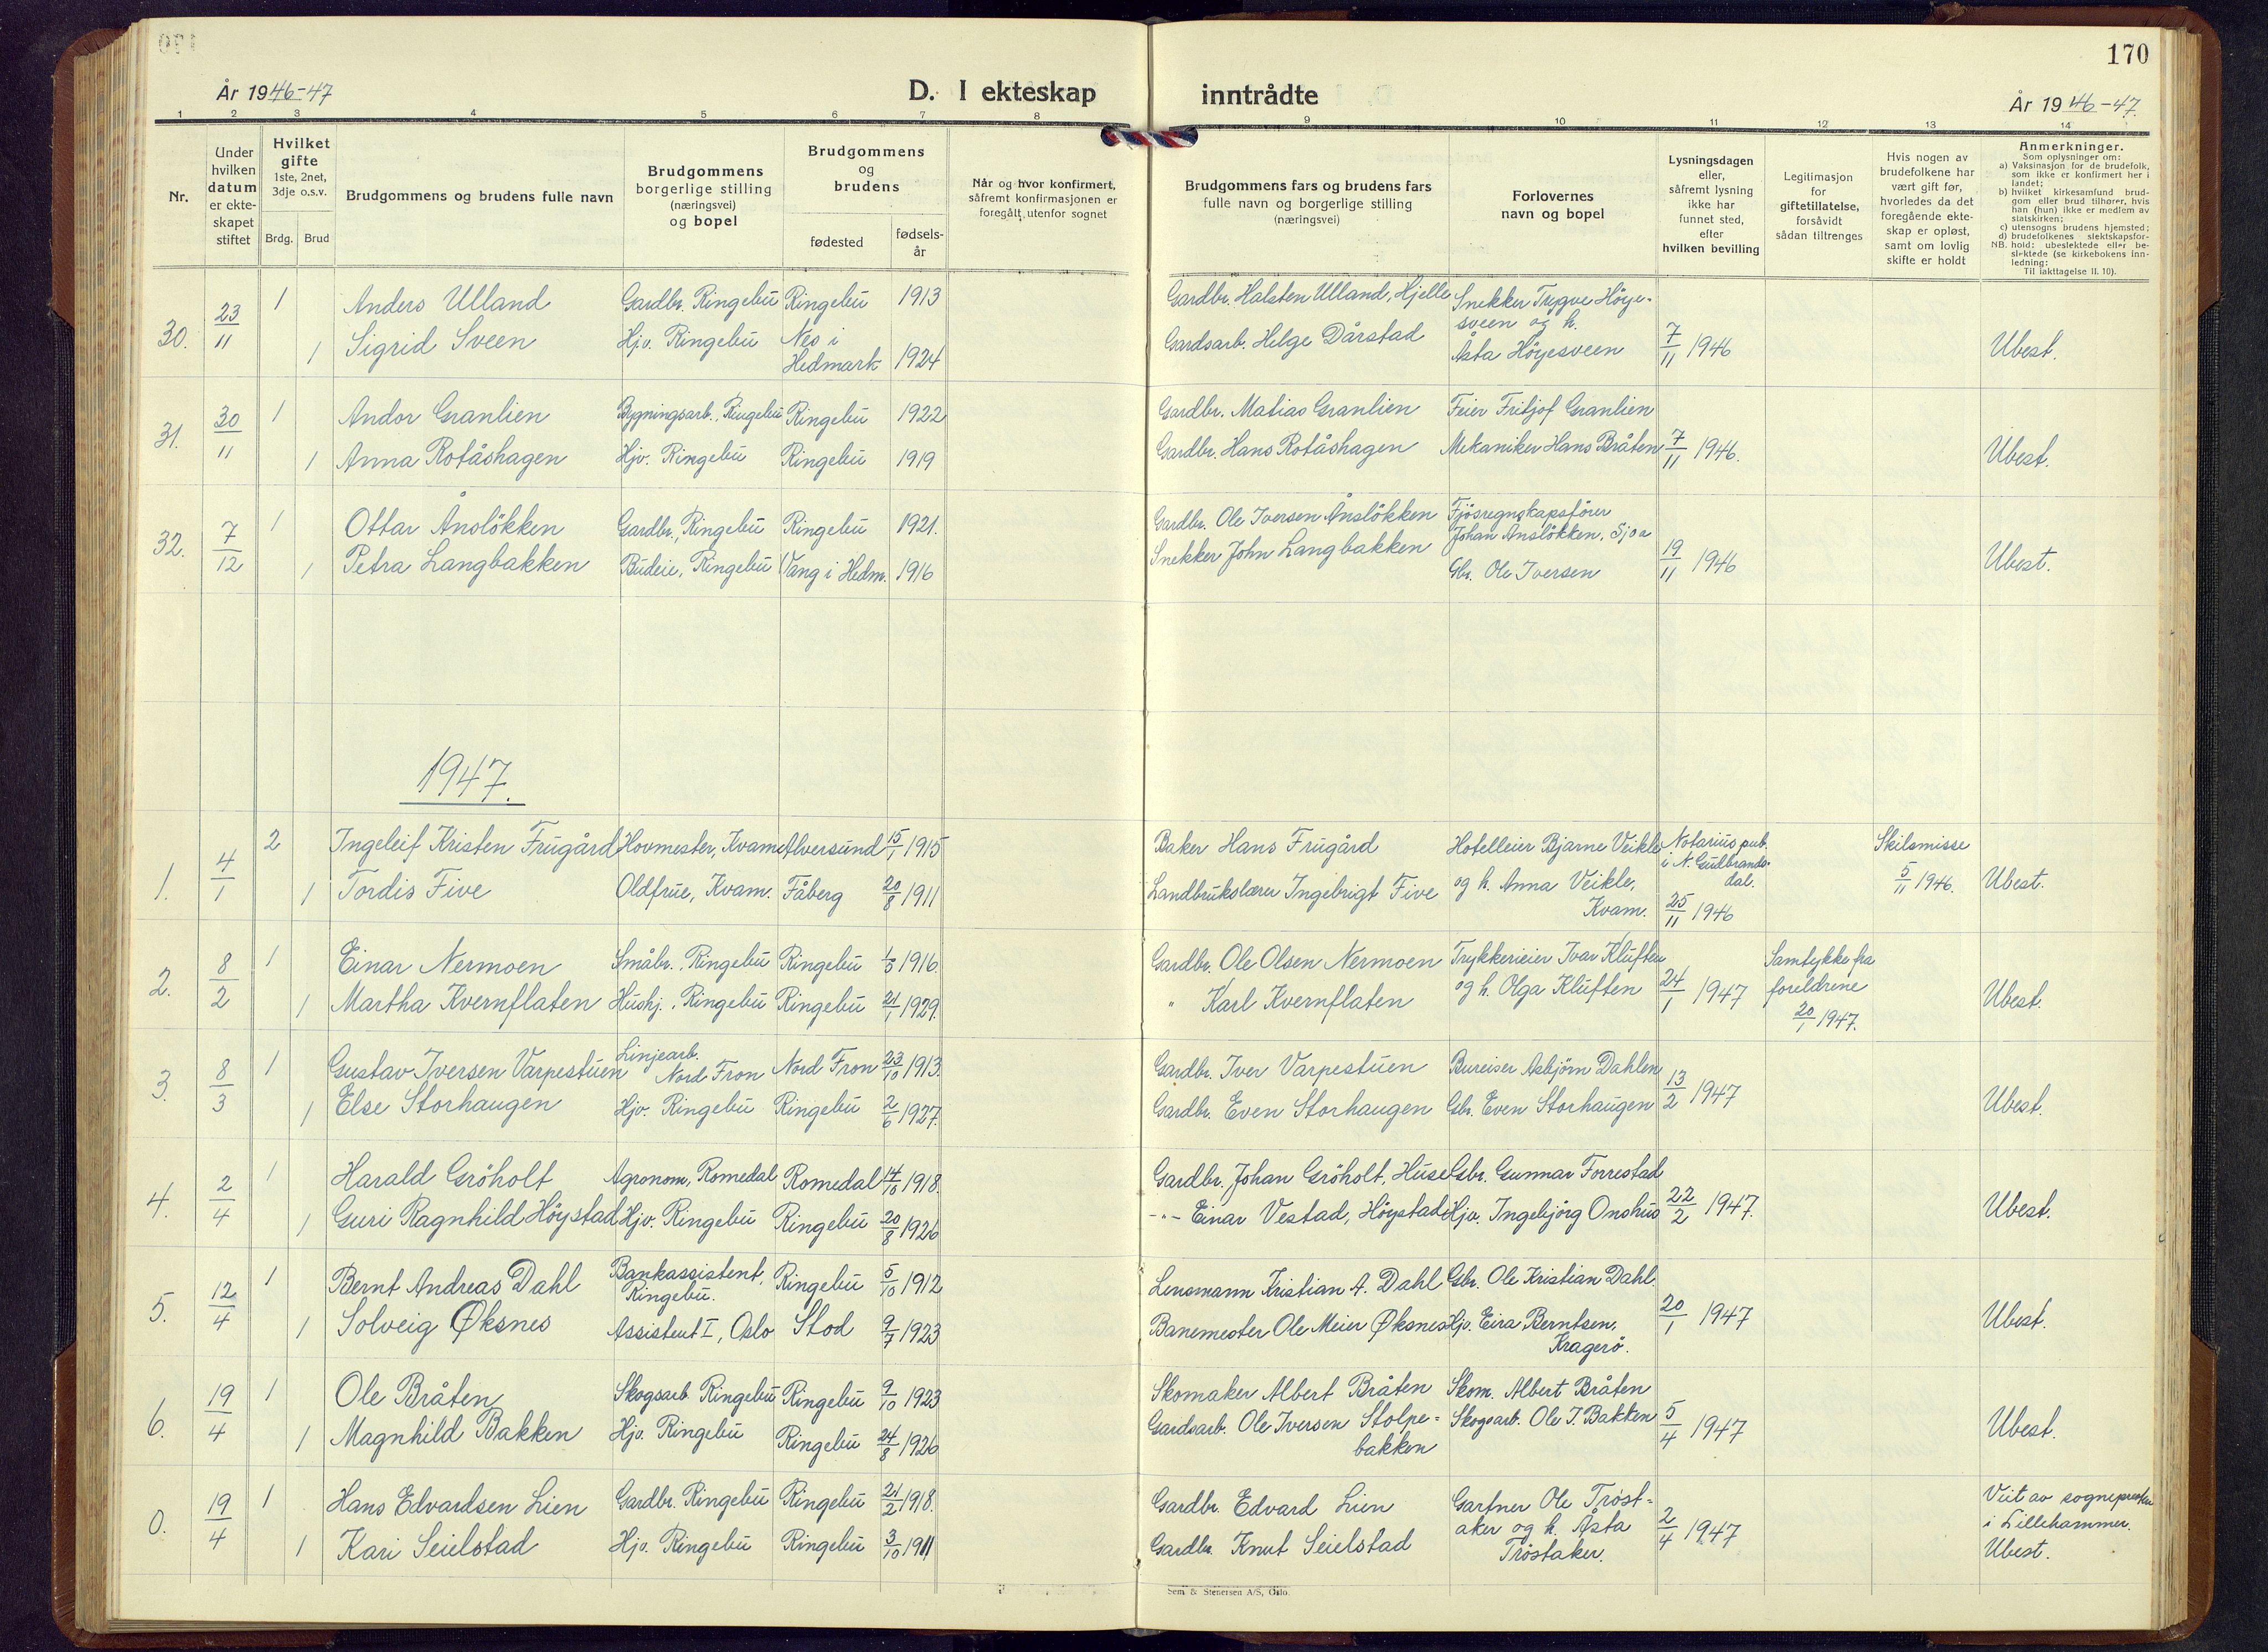 SAH, Ringebu prestekontor, Klokkerbok nr. 13, 1943-1956, s. 170